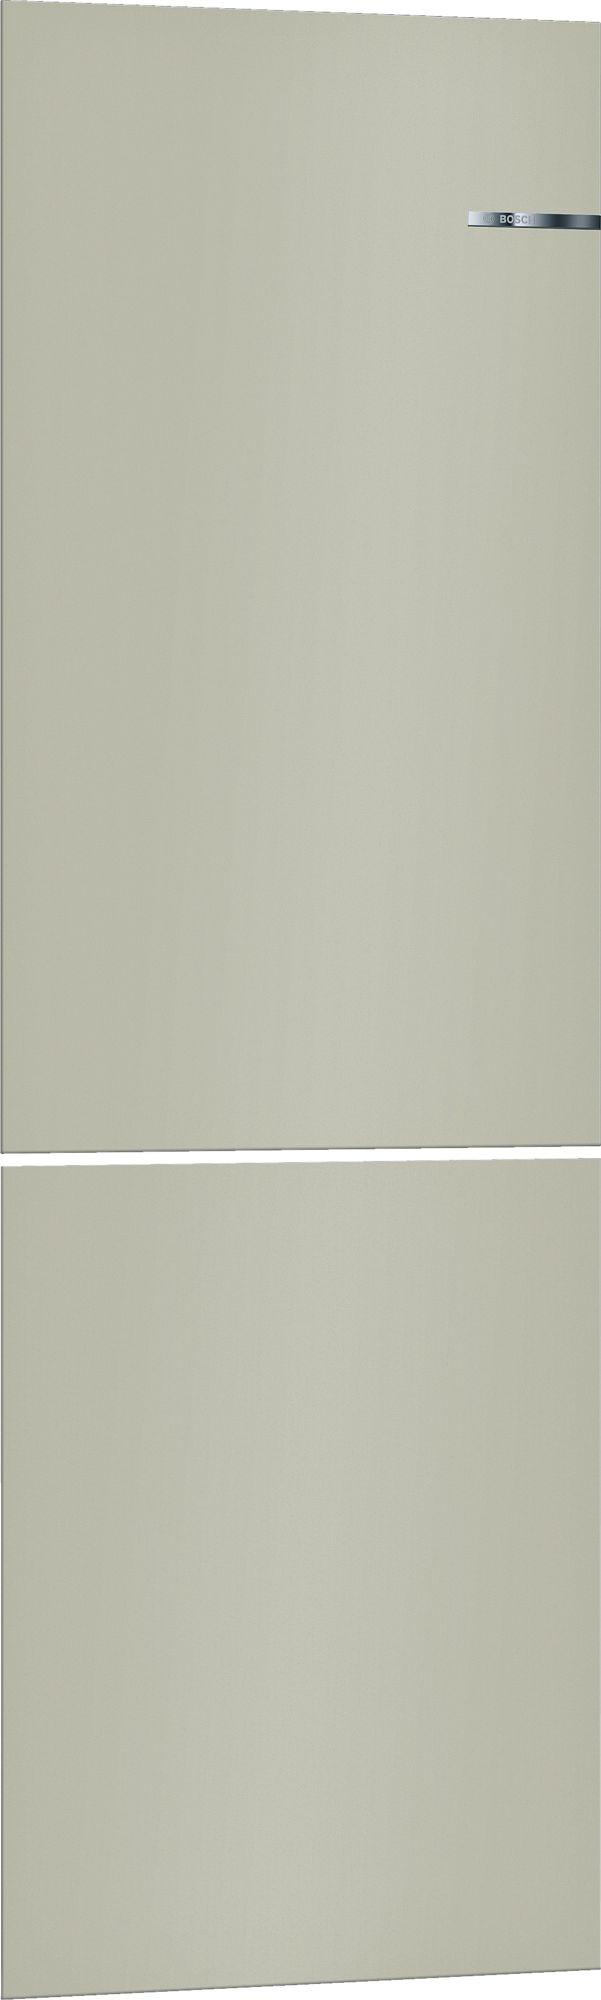 Bosch KSZ1BVK00 203cm Champagne Vario Style Clip Door Set